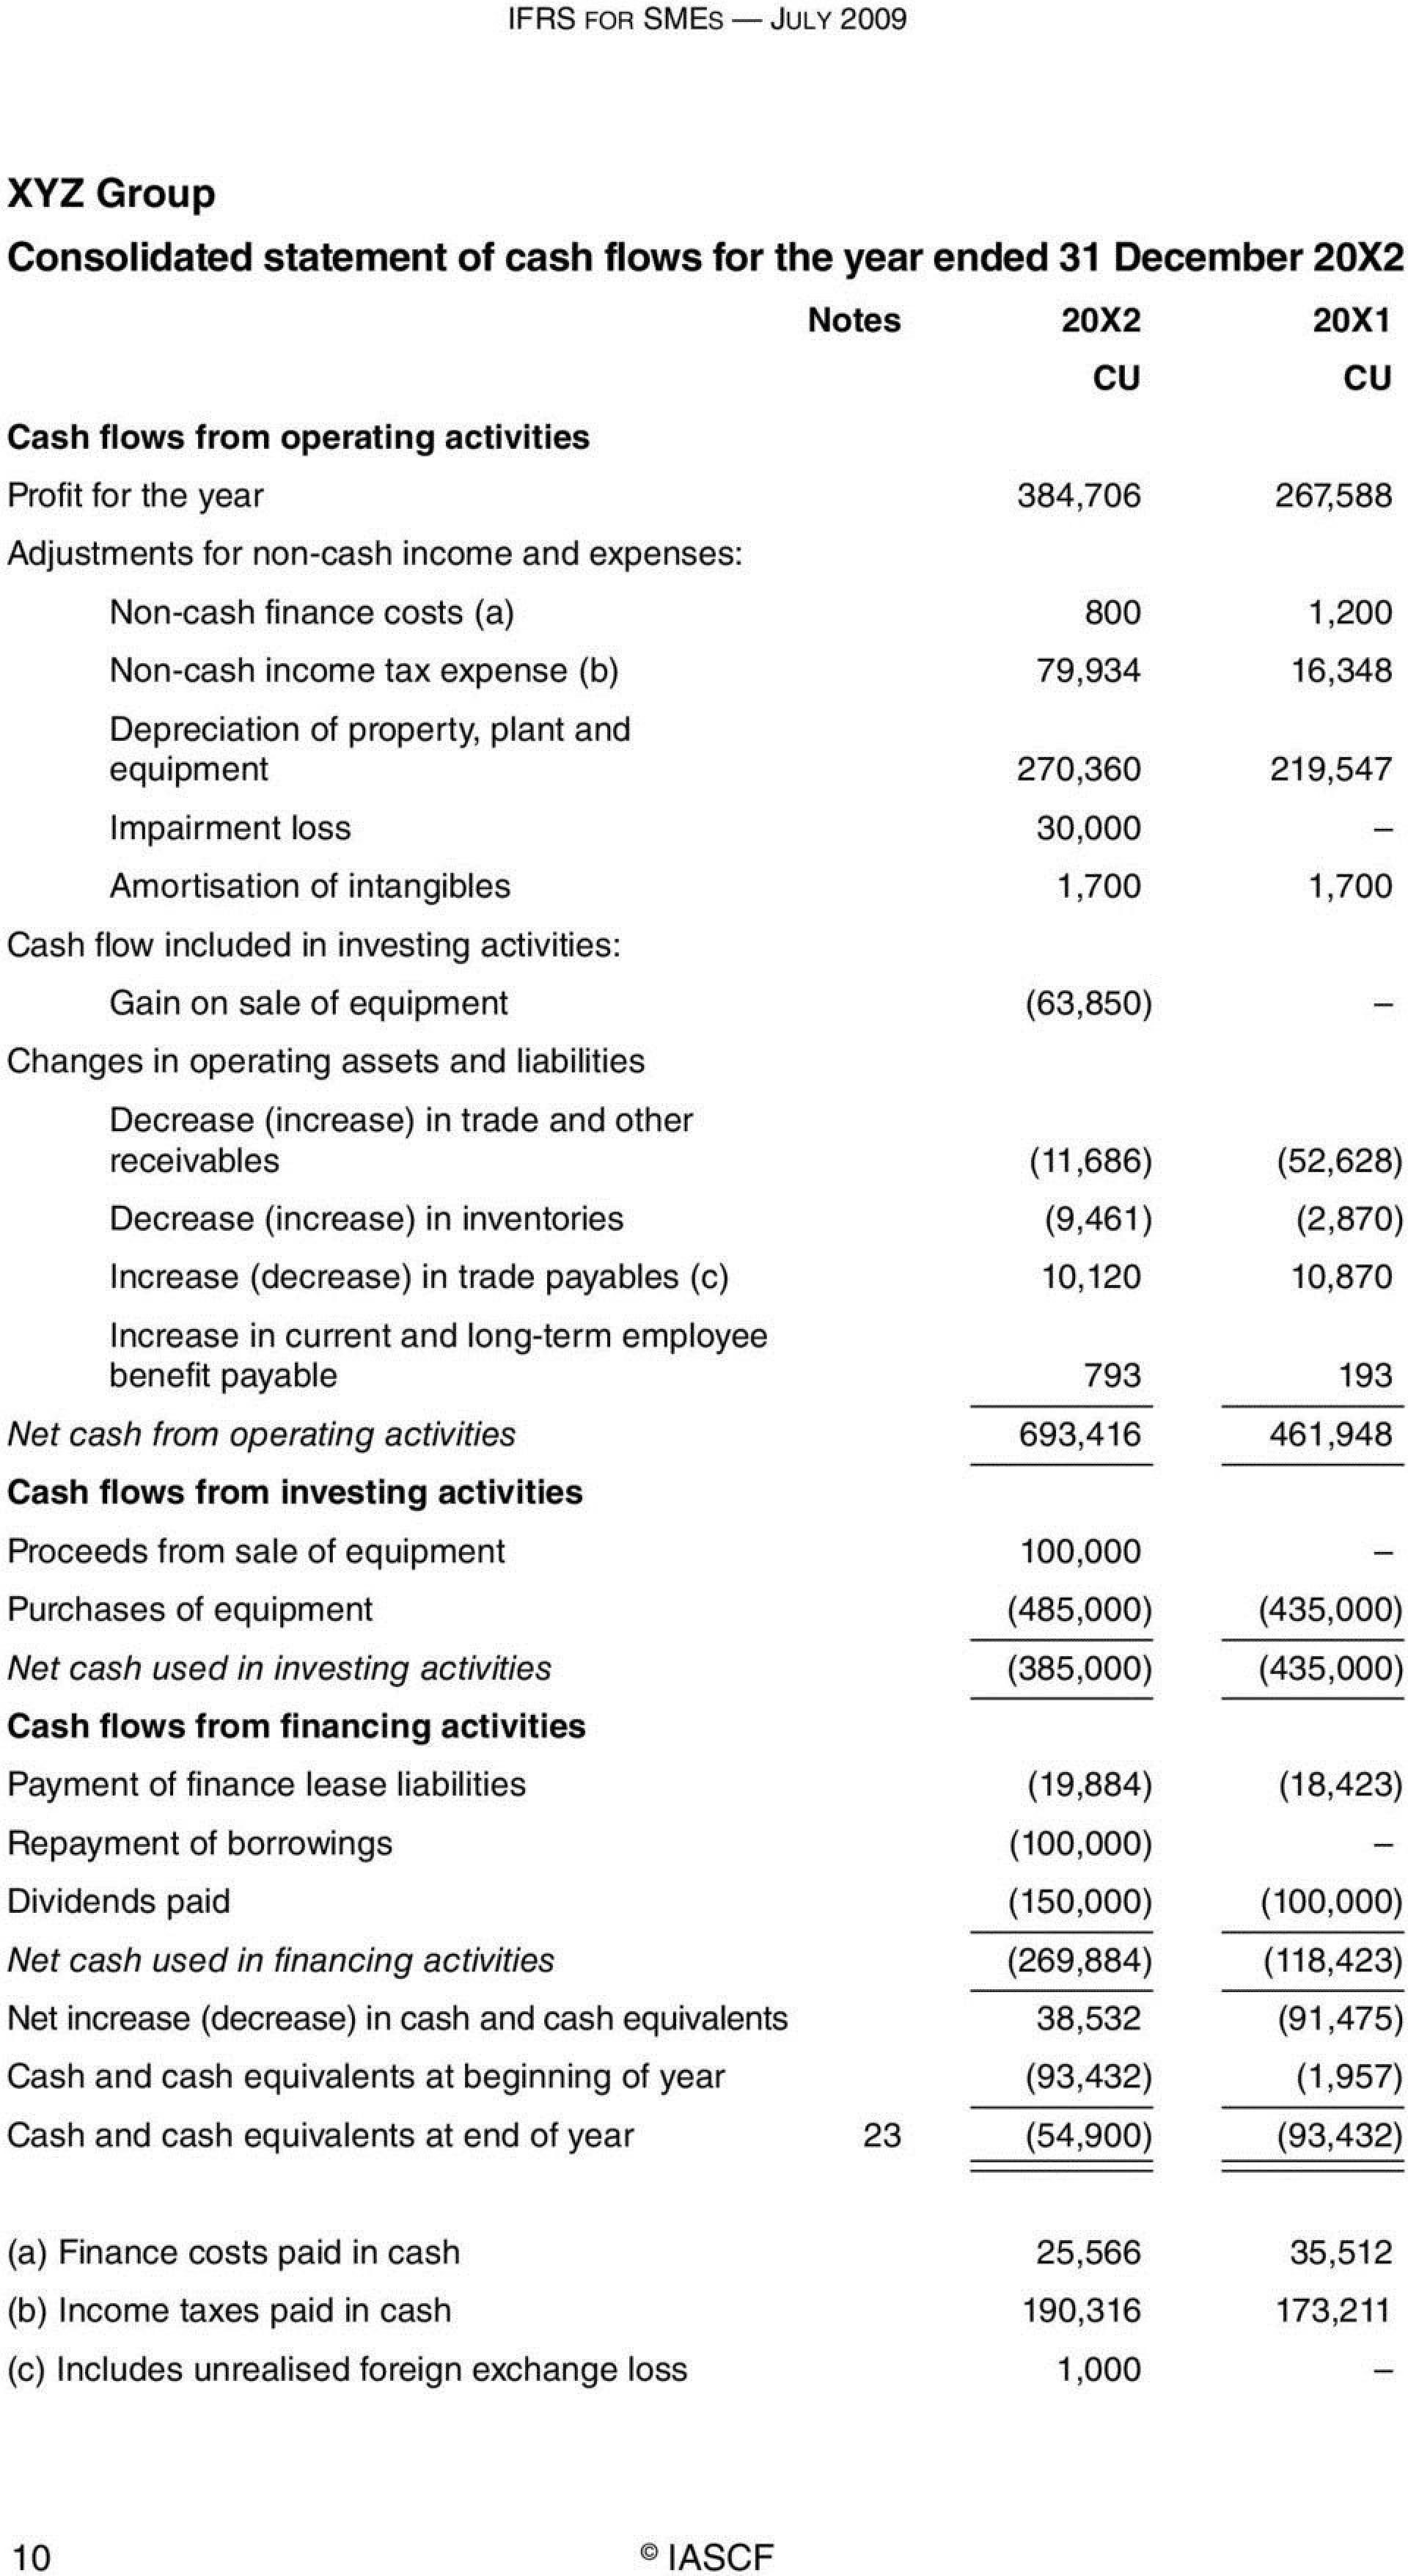 008 Unbelievable Statement Of Cash Flow Template Ifr Design  Ifrs Excel1920